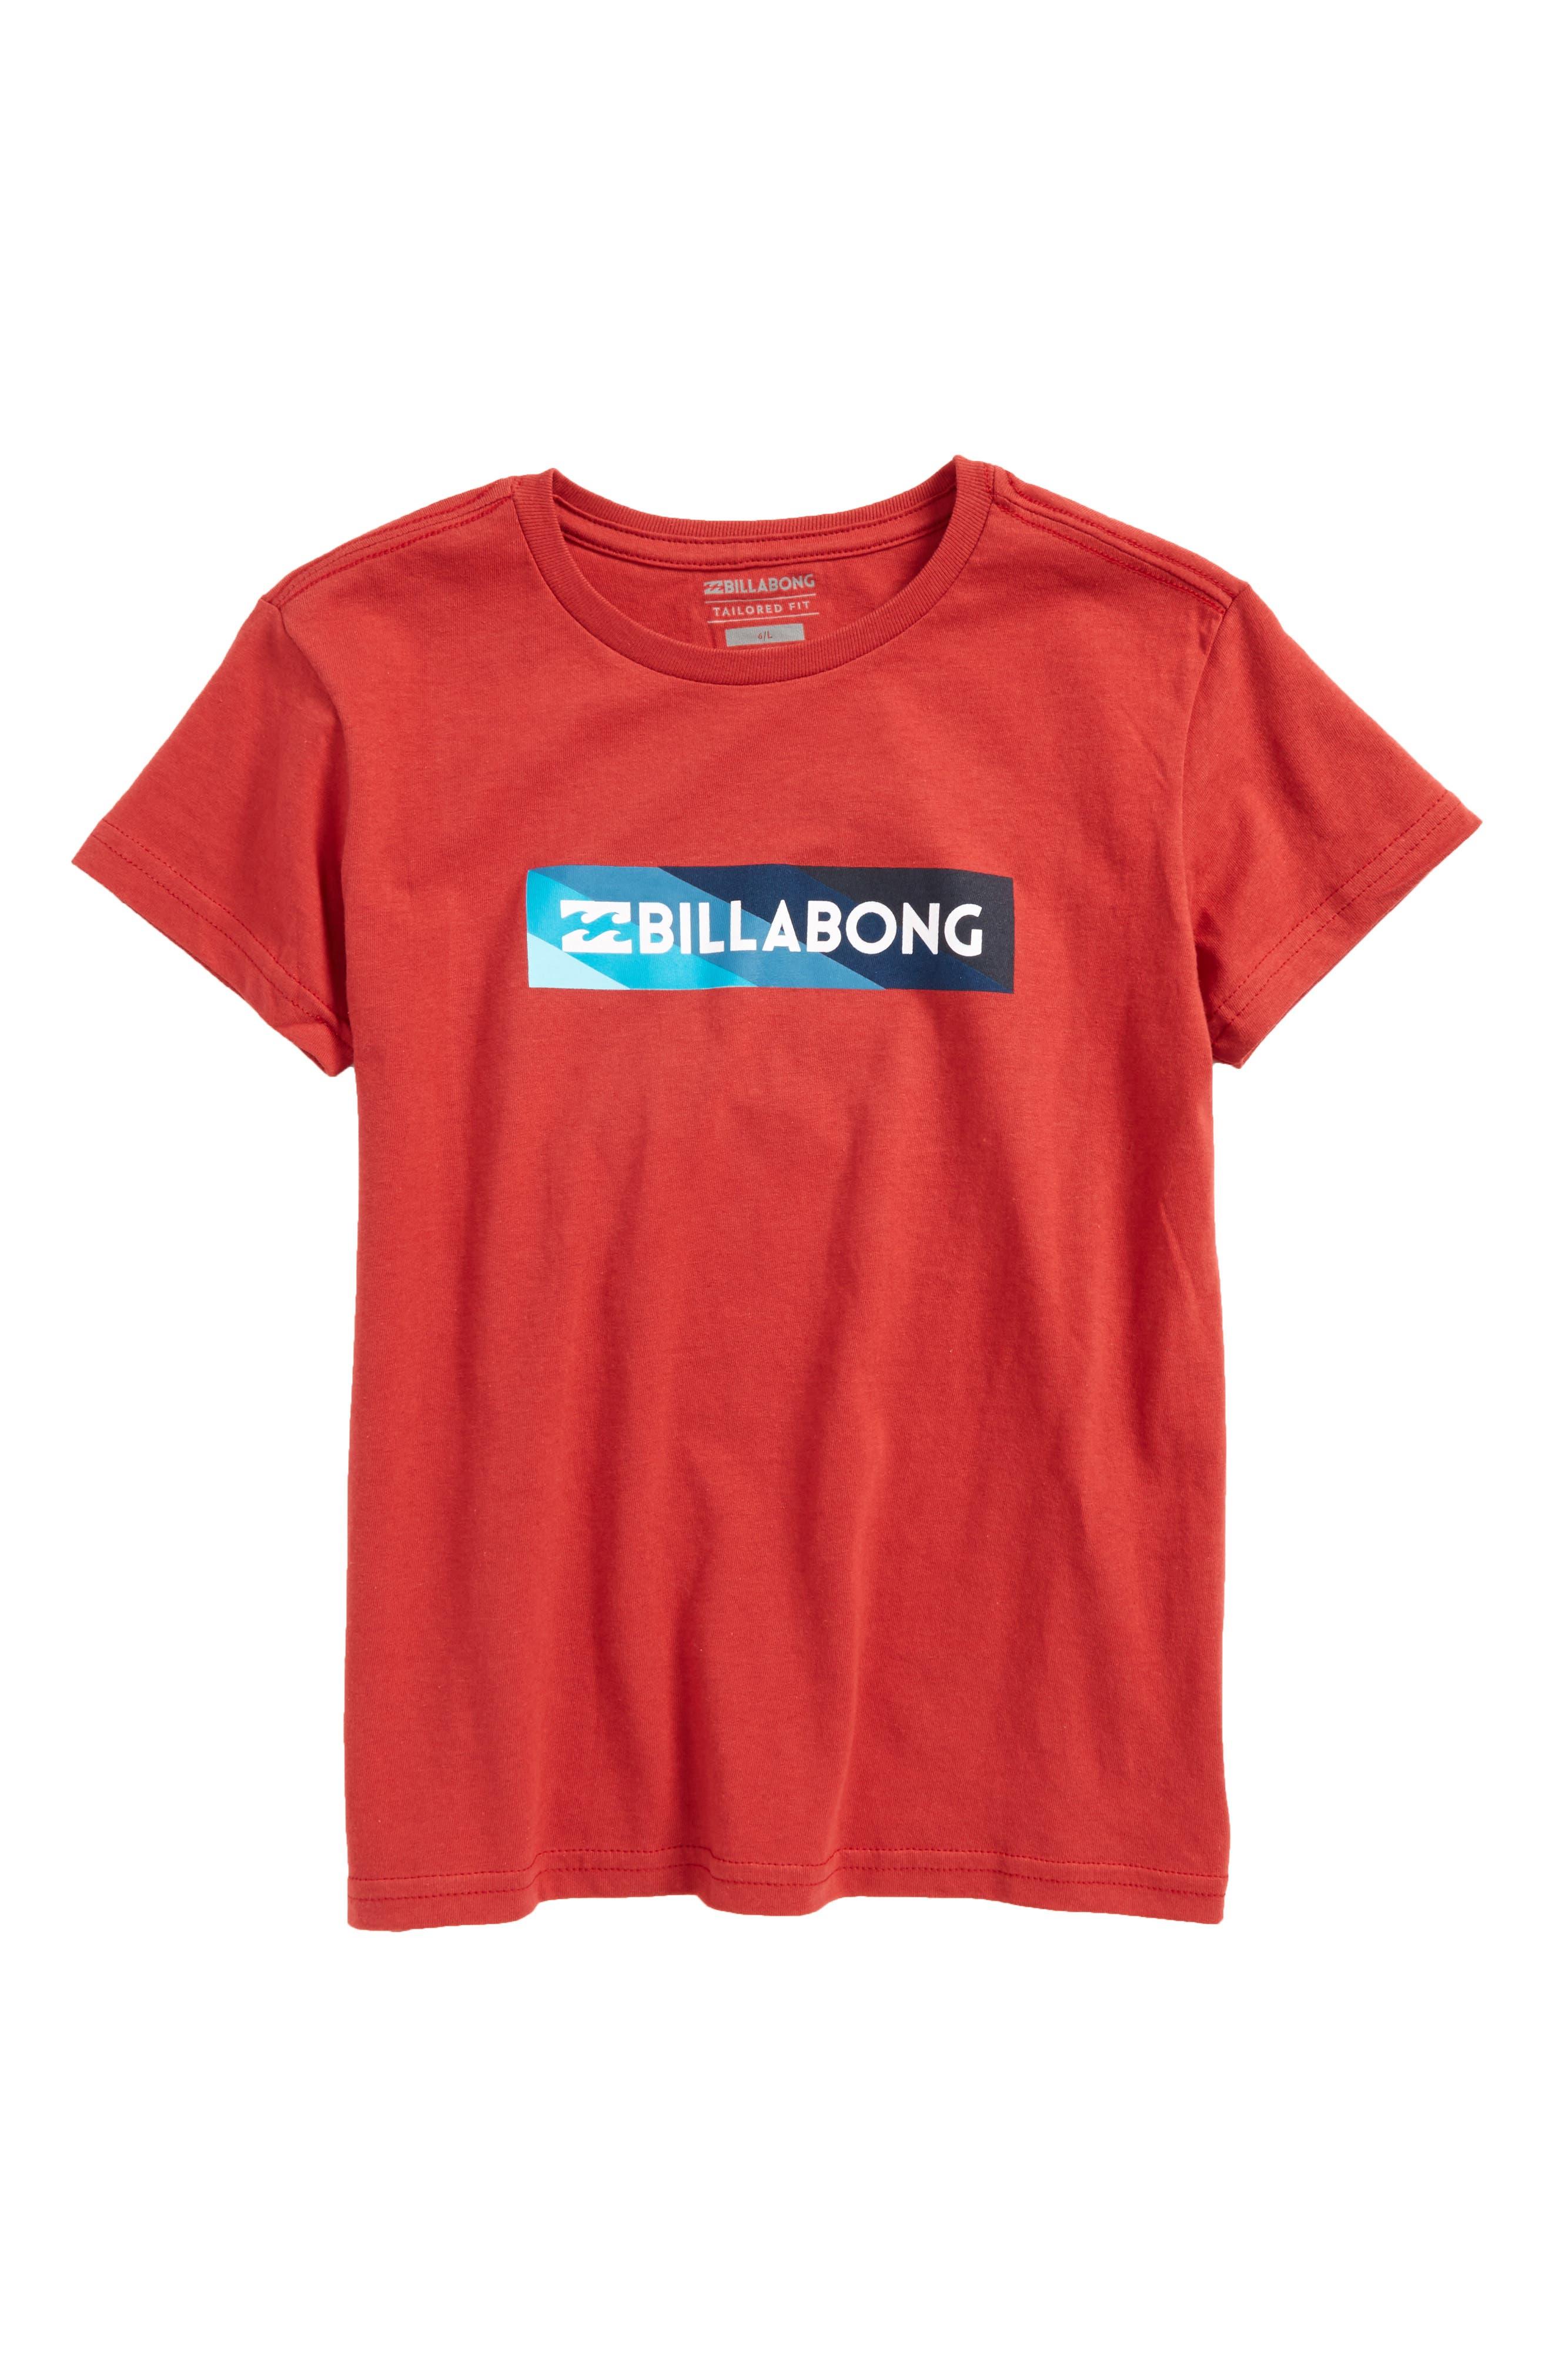 Alternate Image 1 Selected - Billabong Unity Block Graphic T-Shirt (Toddler Boys & Little Boys)